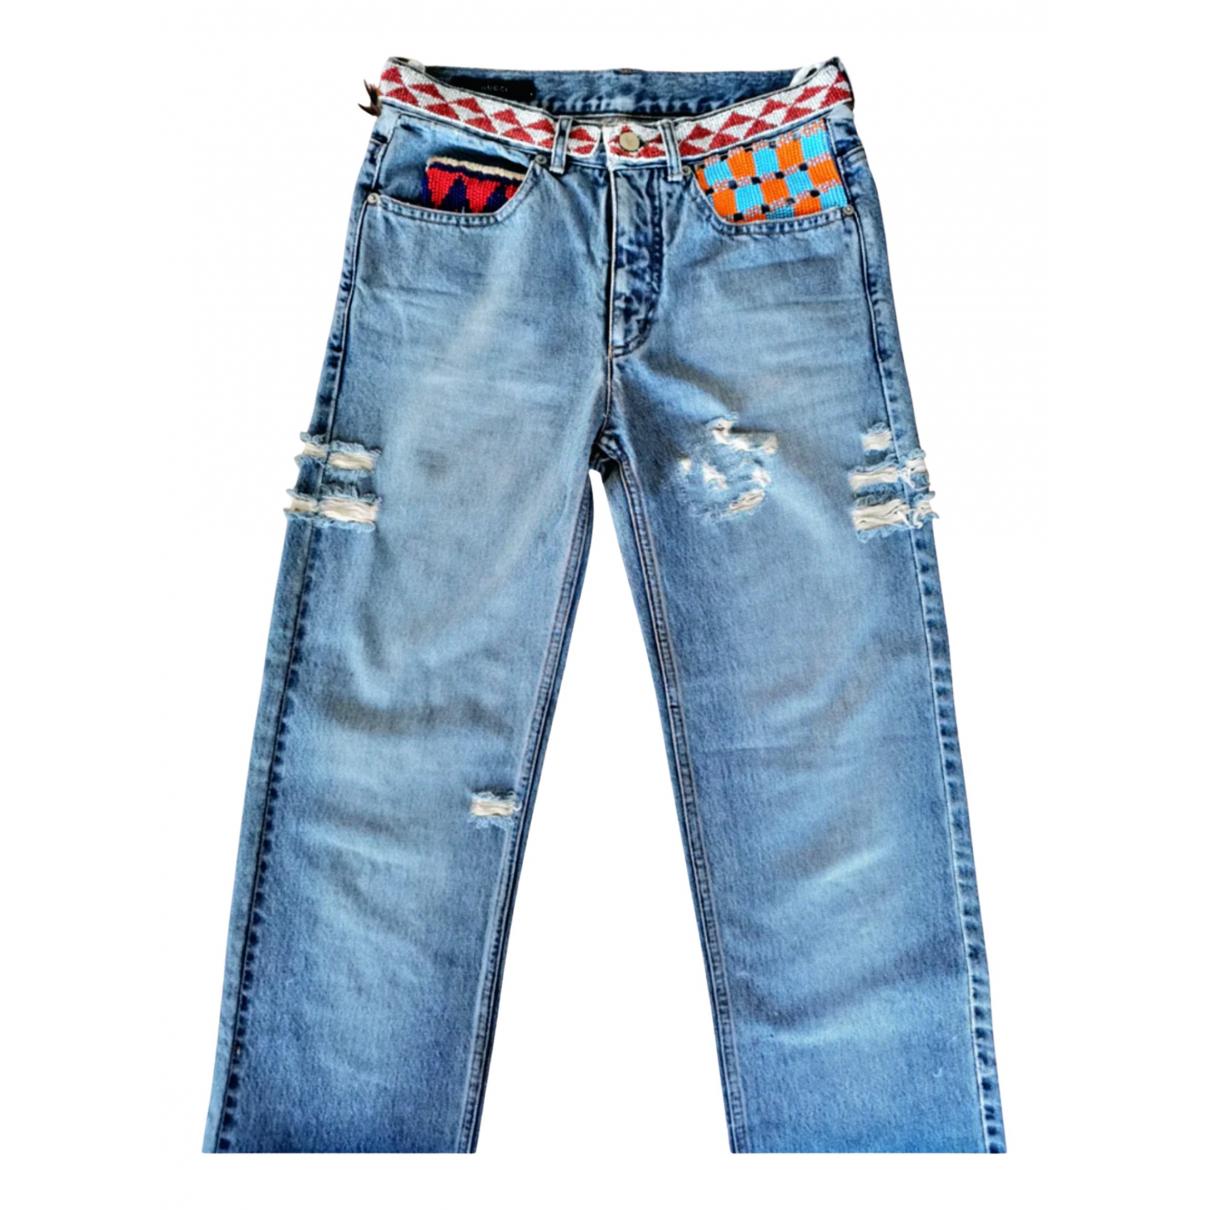 Gucci N Blue Denim - Jeans Jeans for Women